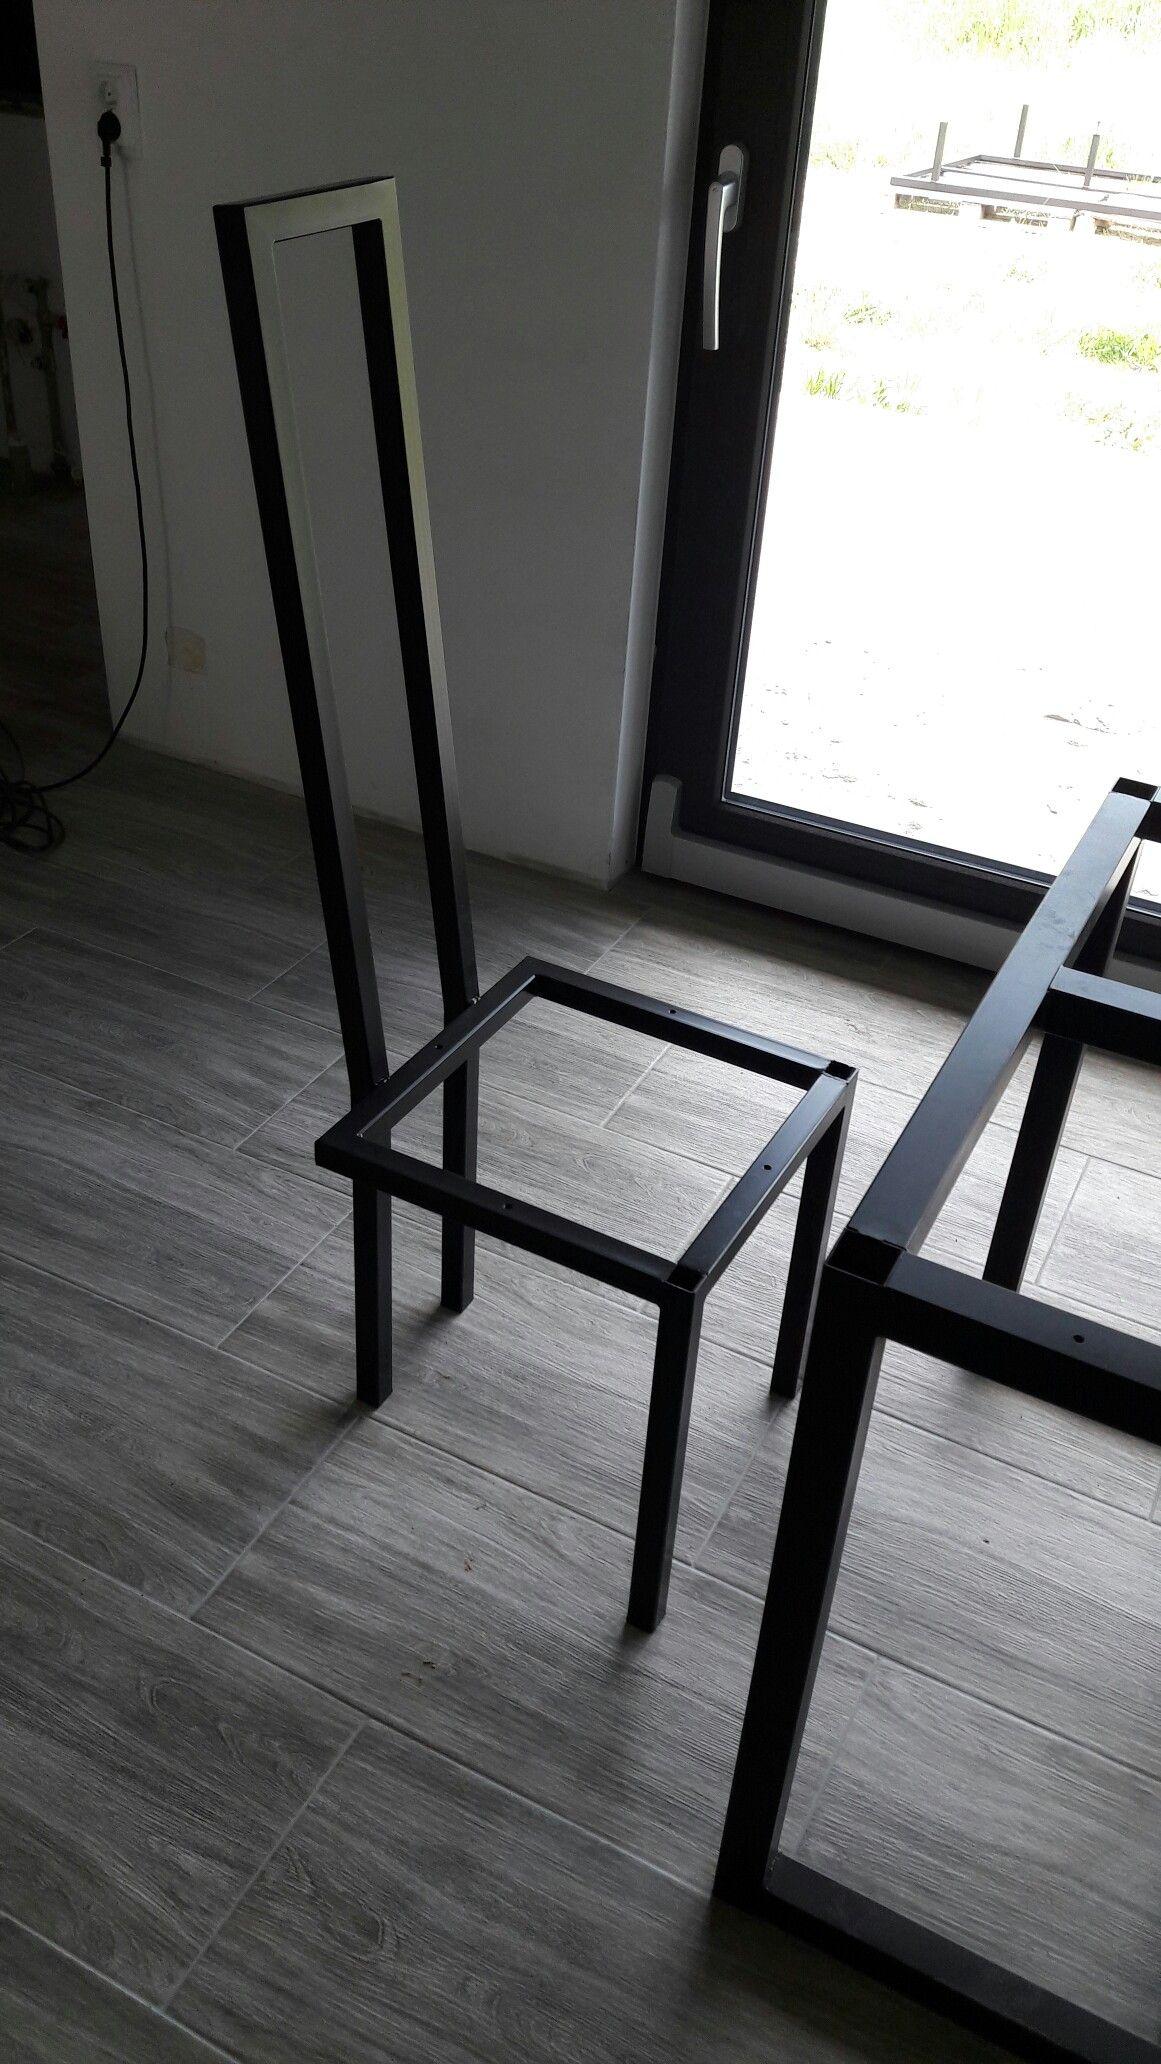 welded furniture Home Improvements Pinterest